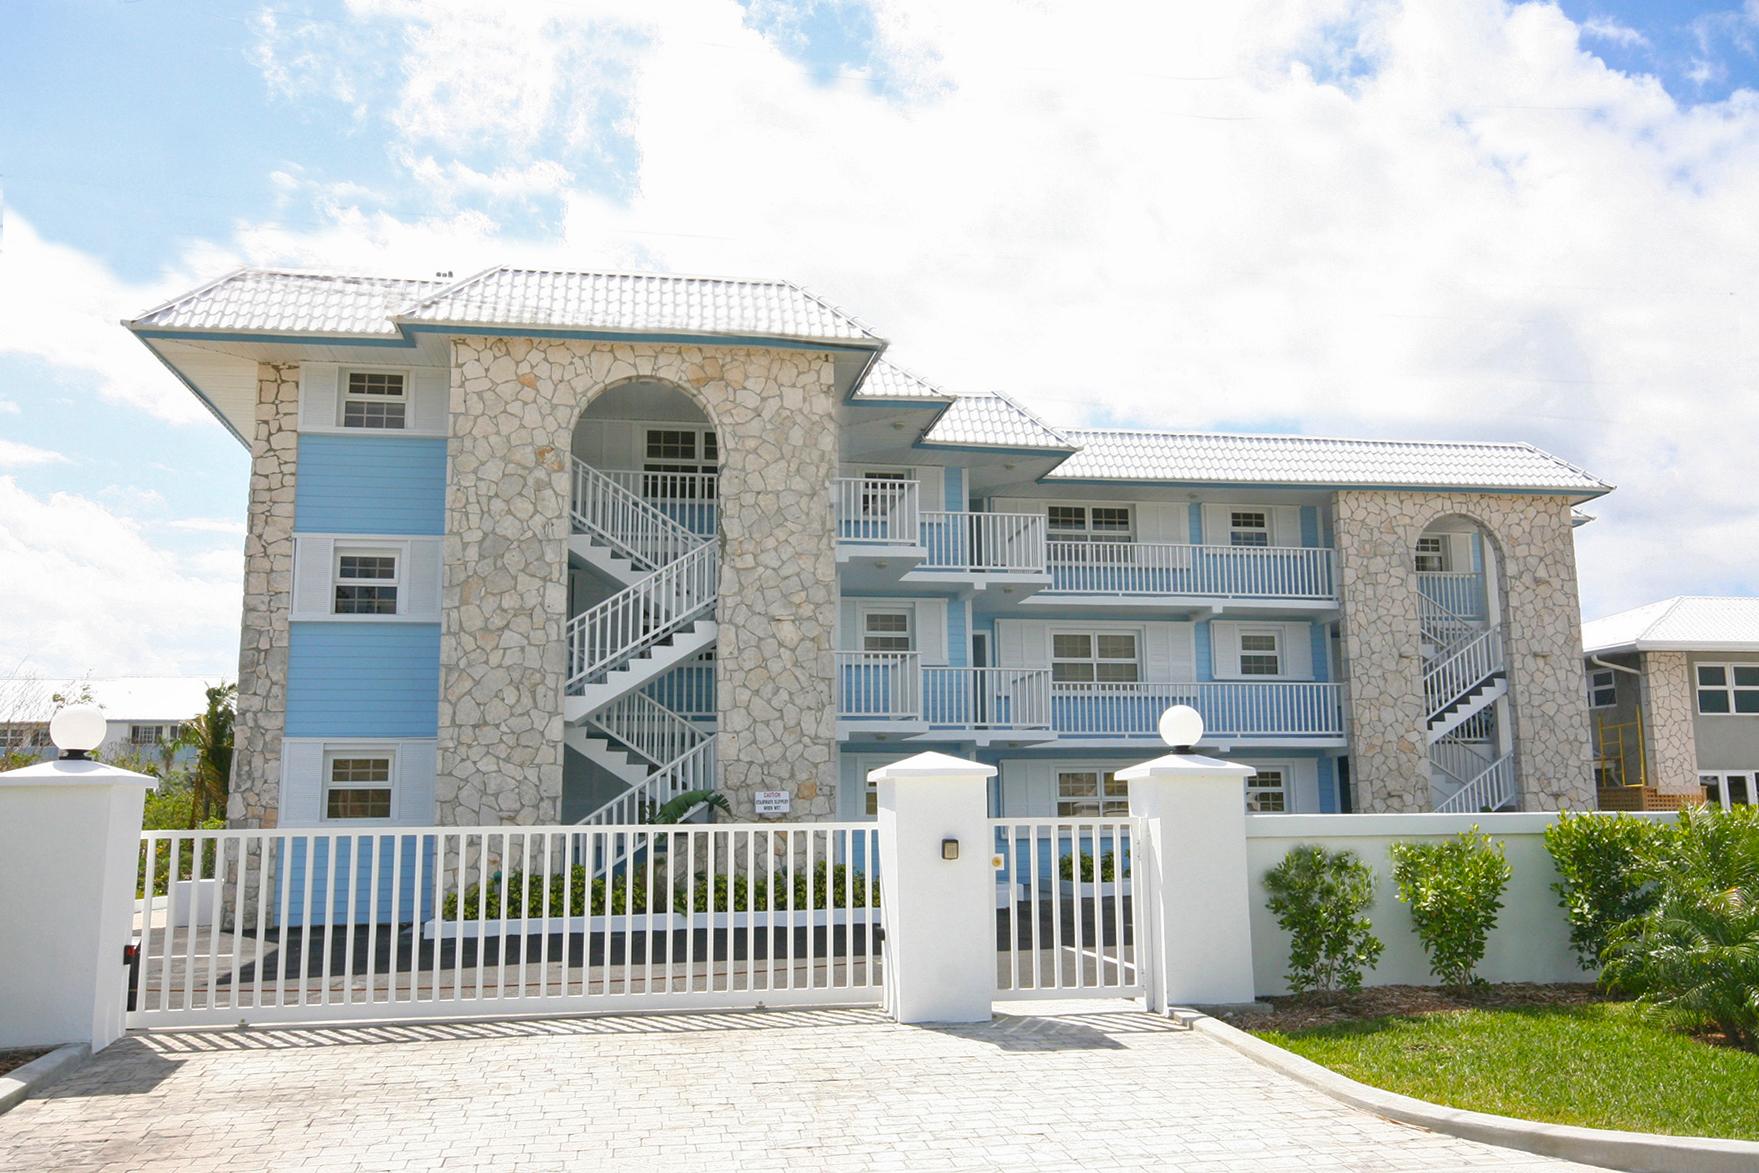 Brand New Luxury 2 Bedroom Condo on the Canal in Lucaya Grand Bahama, Bahamas